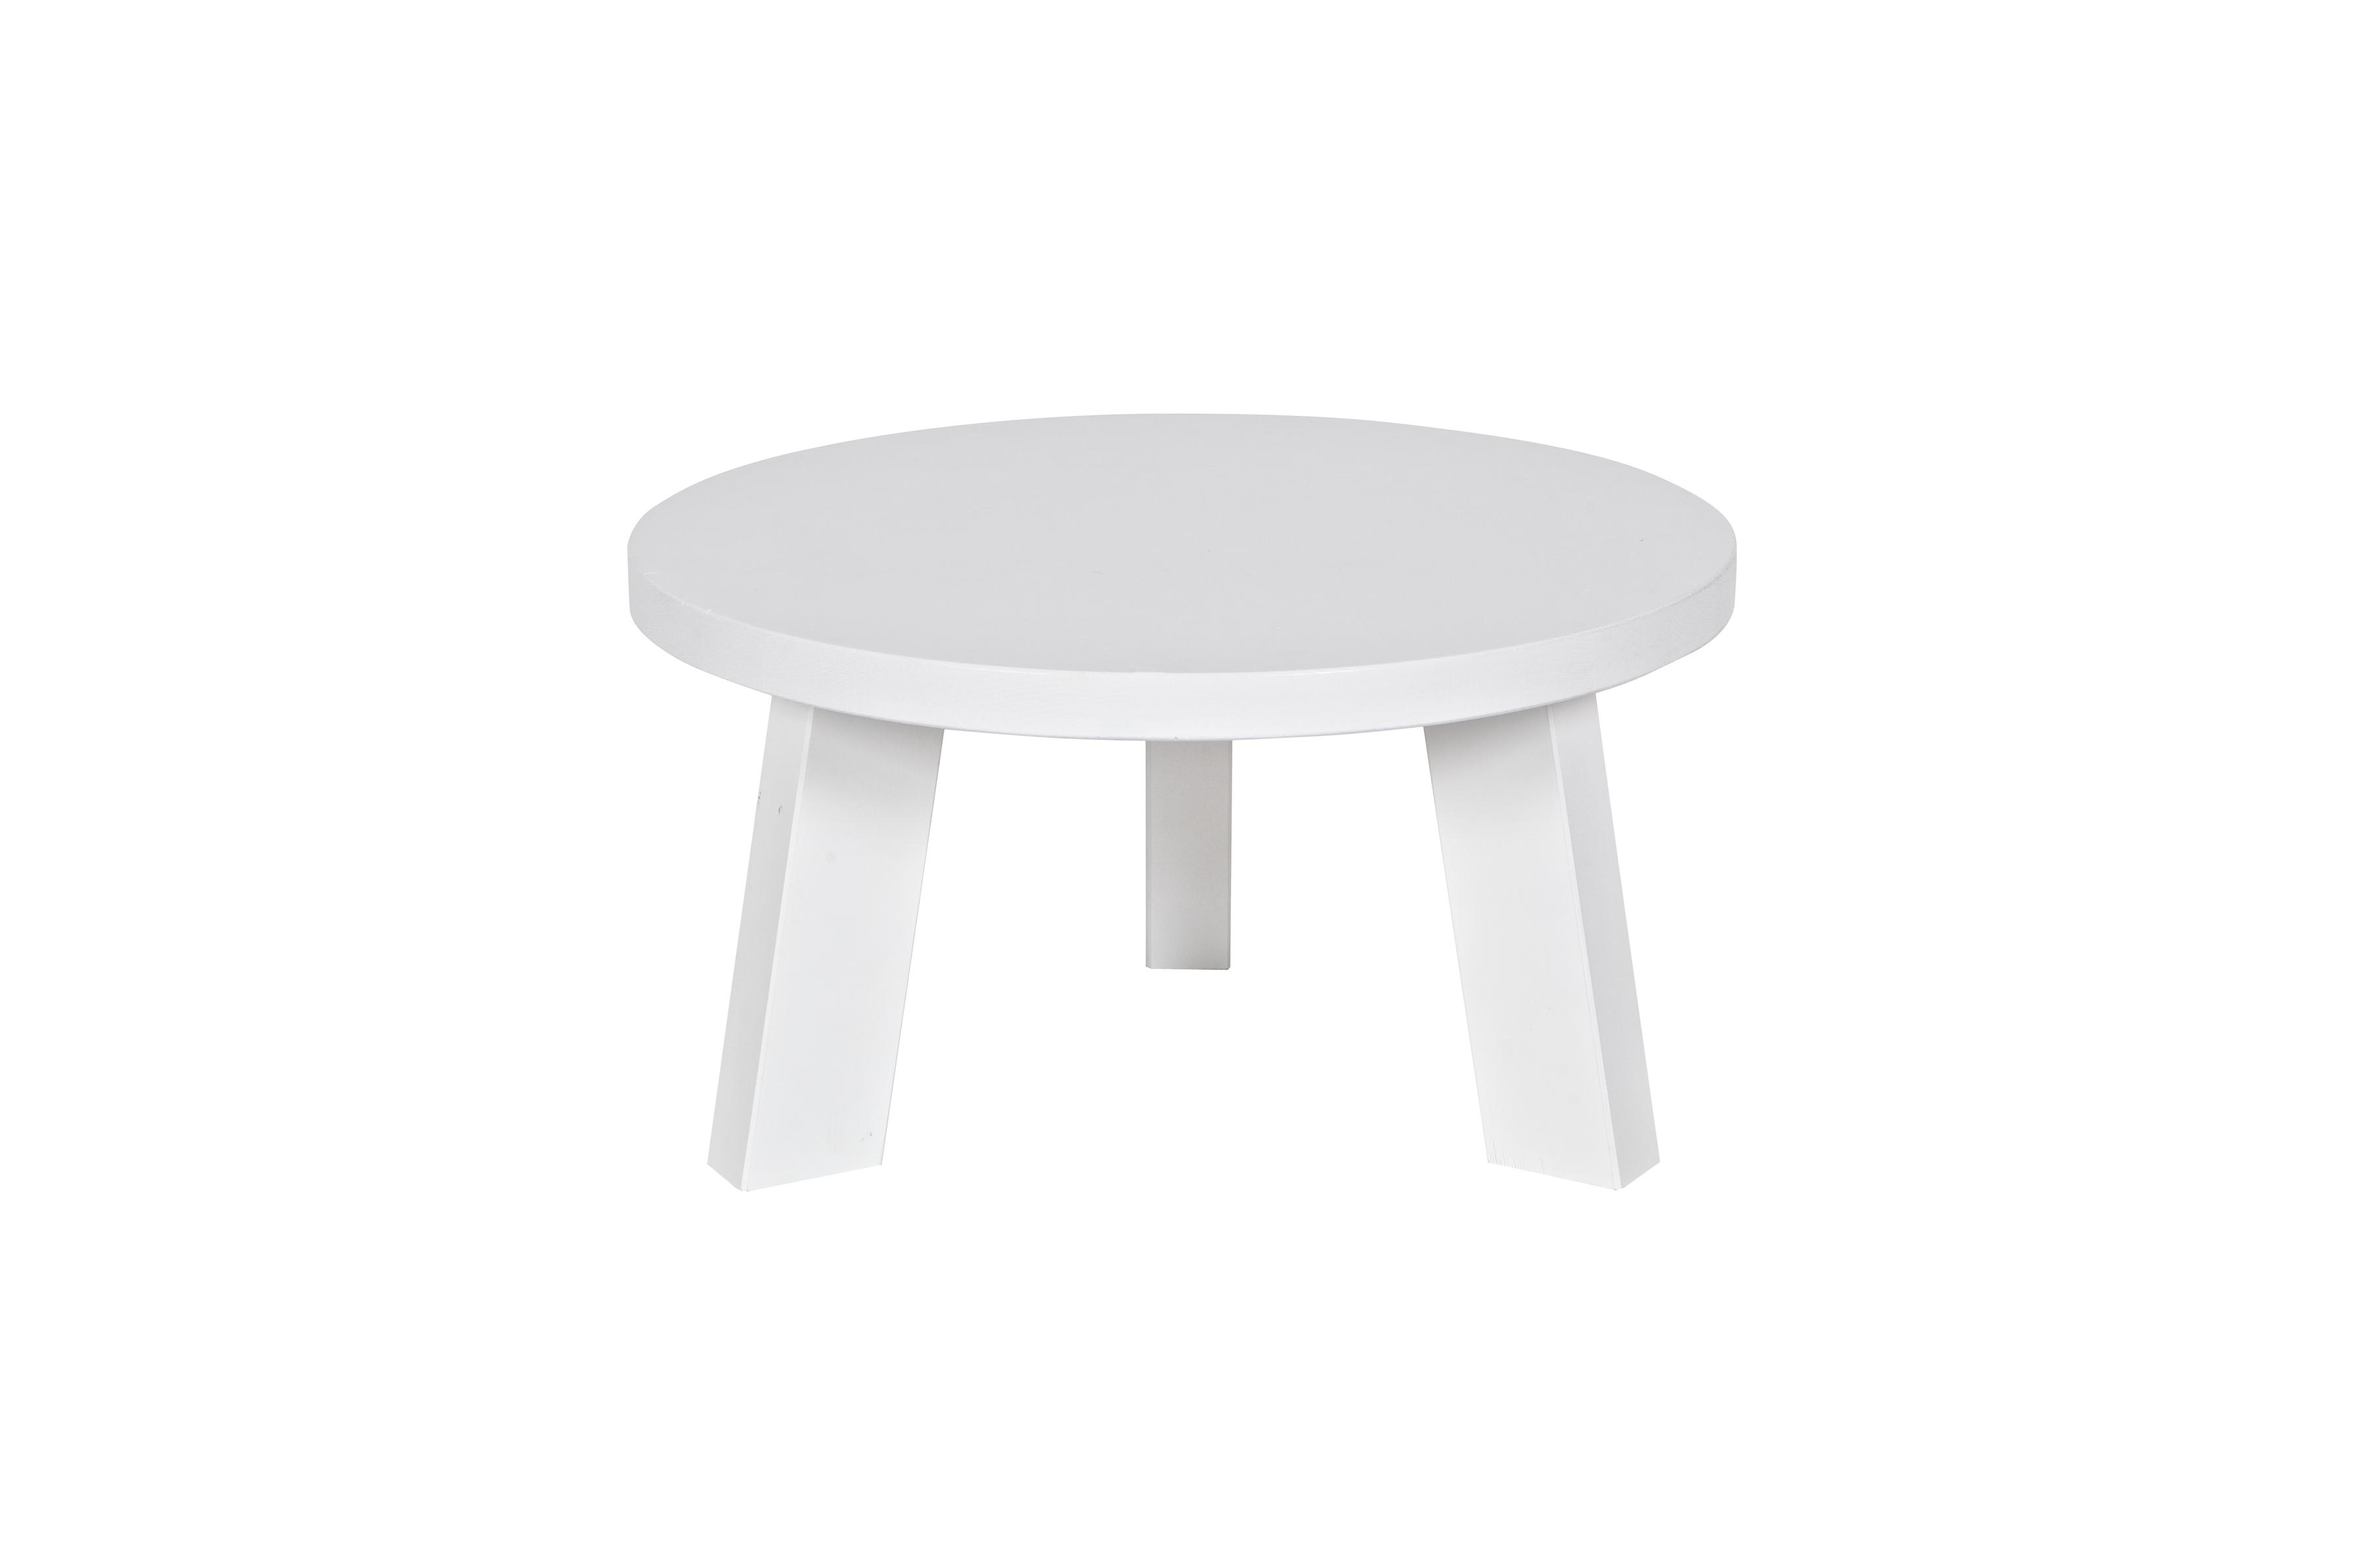 Witte ronde eettafel witte moderne moderne hout witte ronde mooie